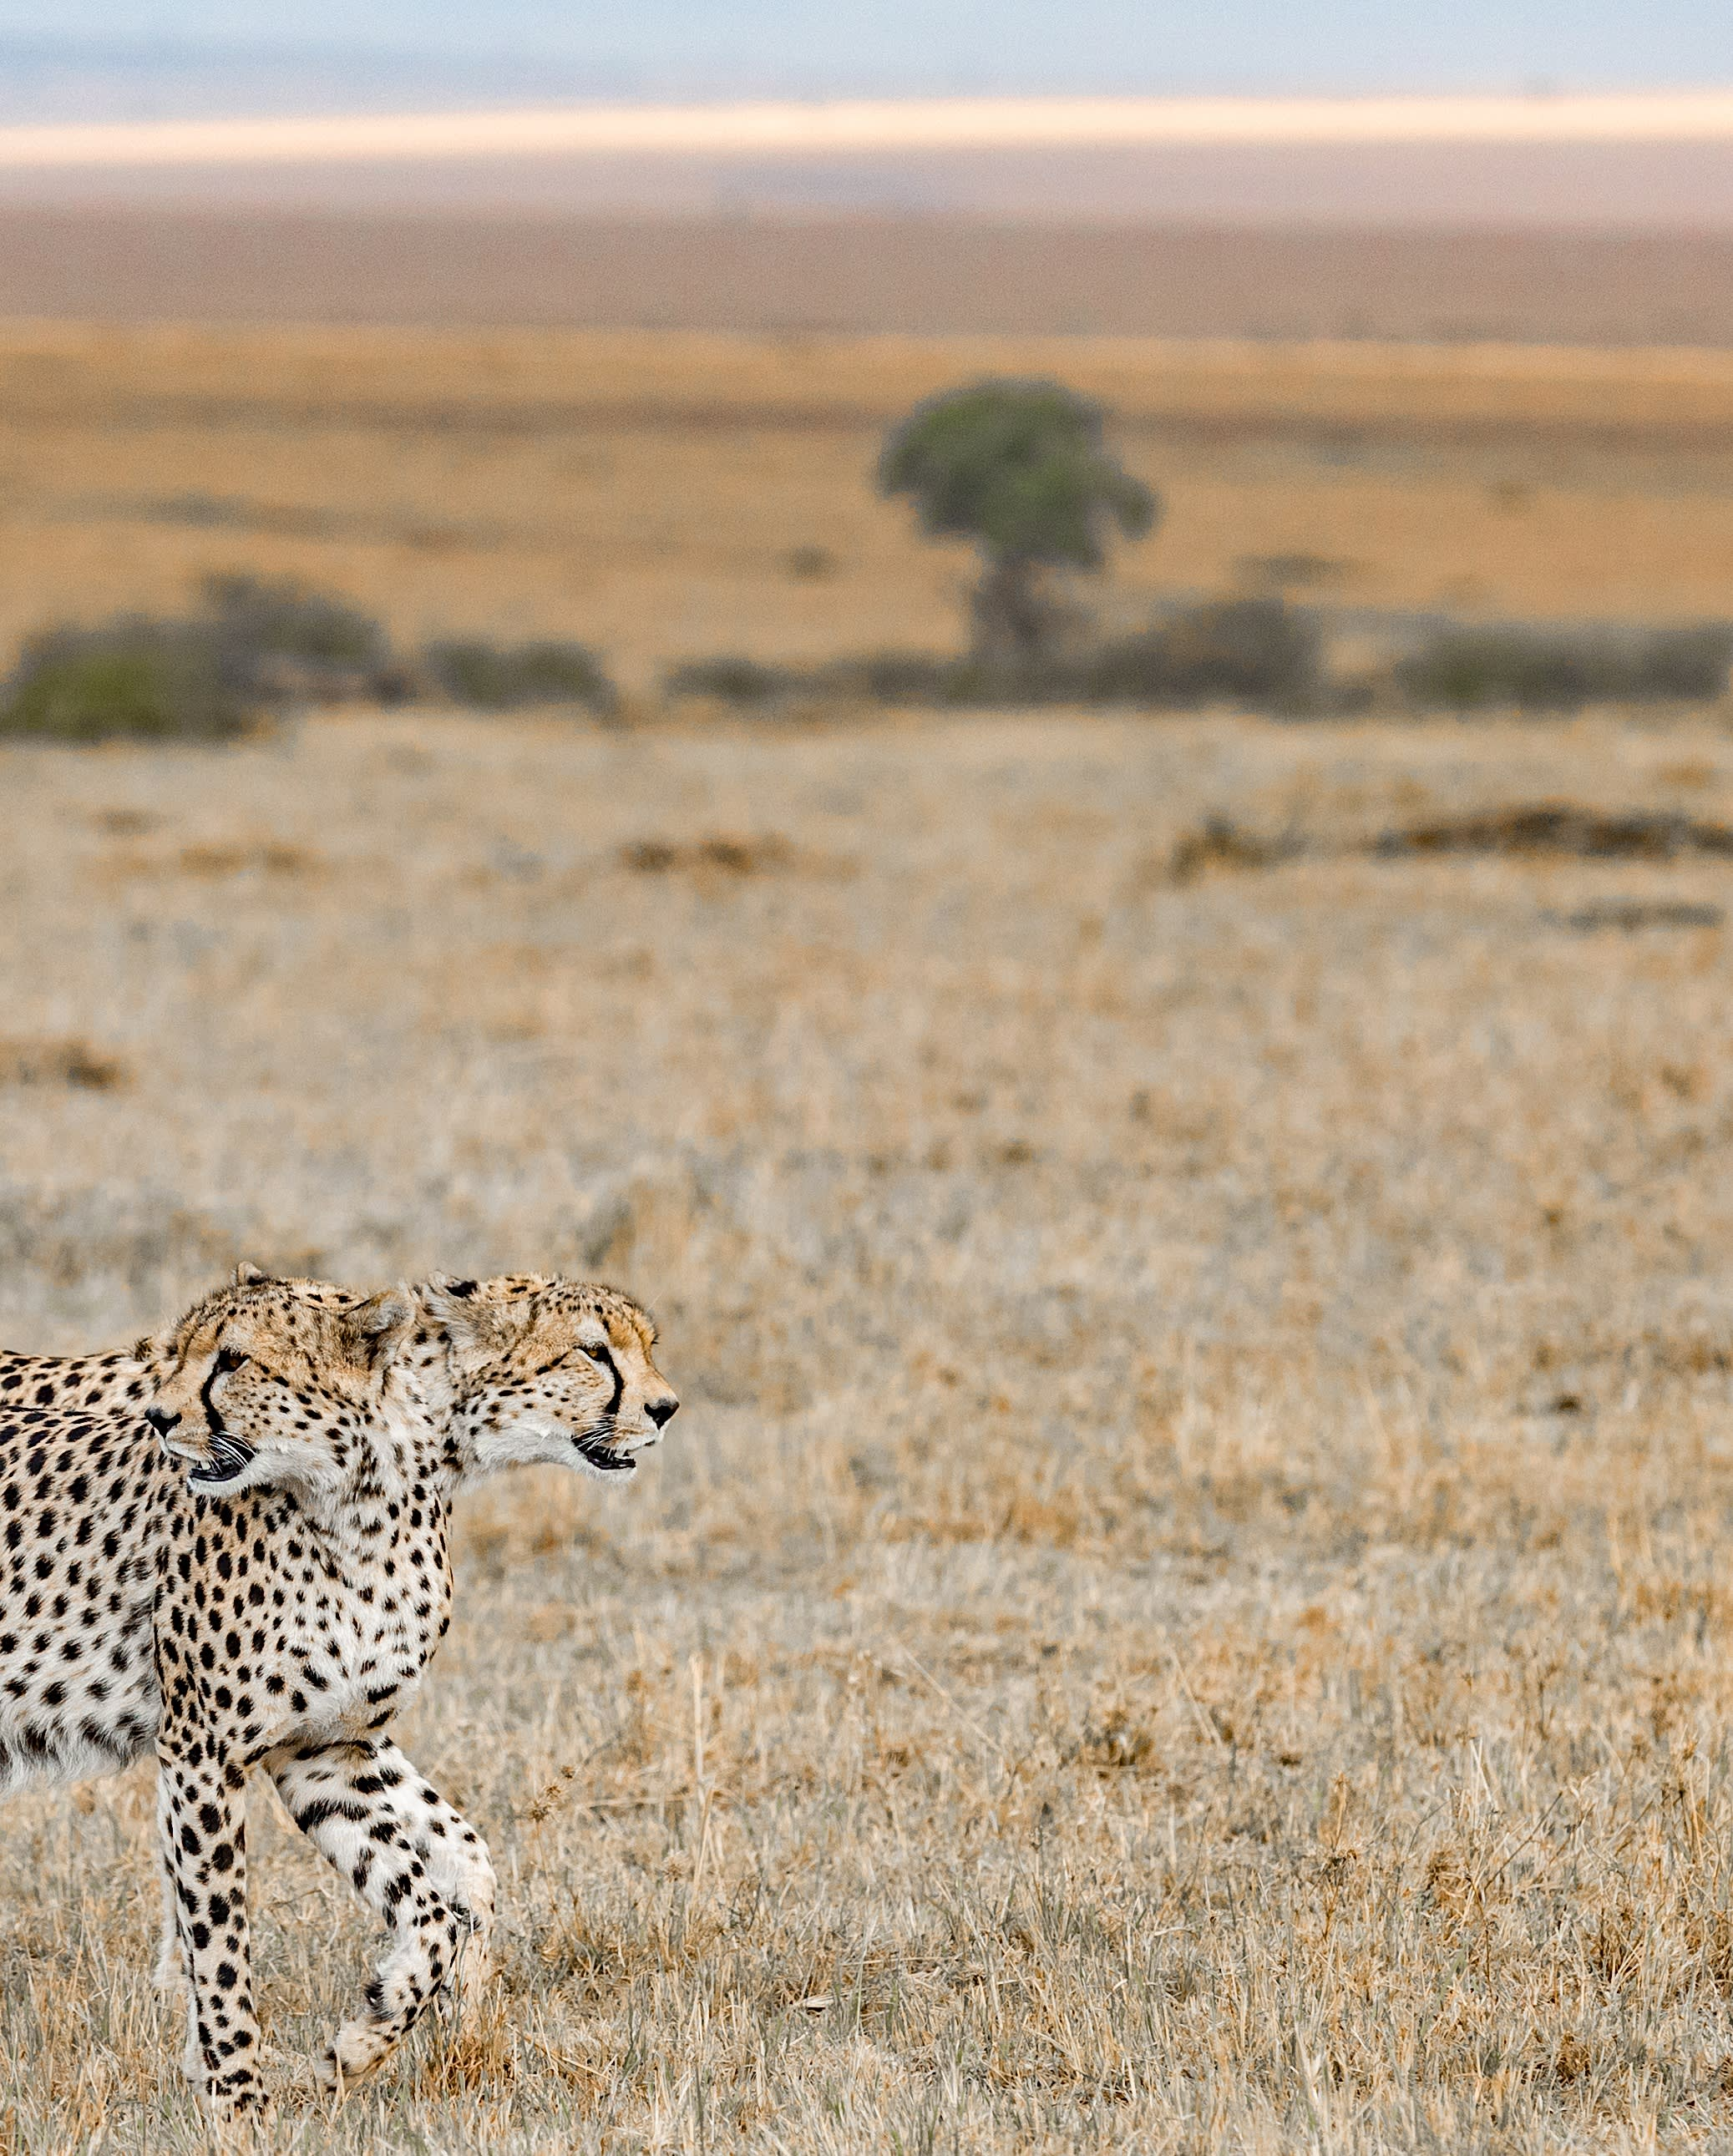 The Two headed Cheetah